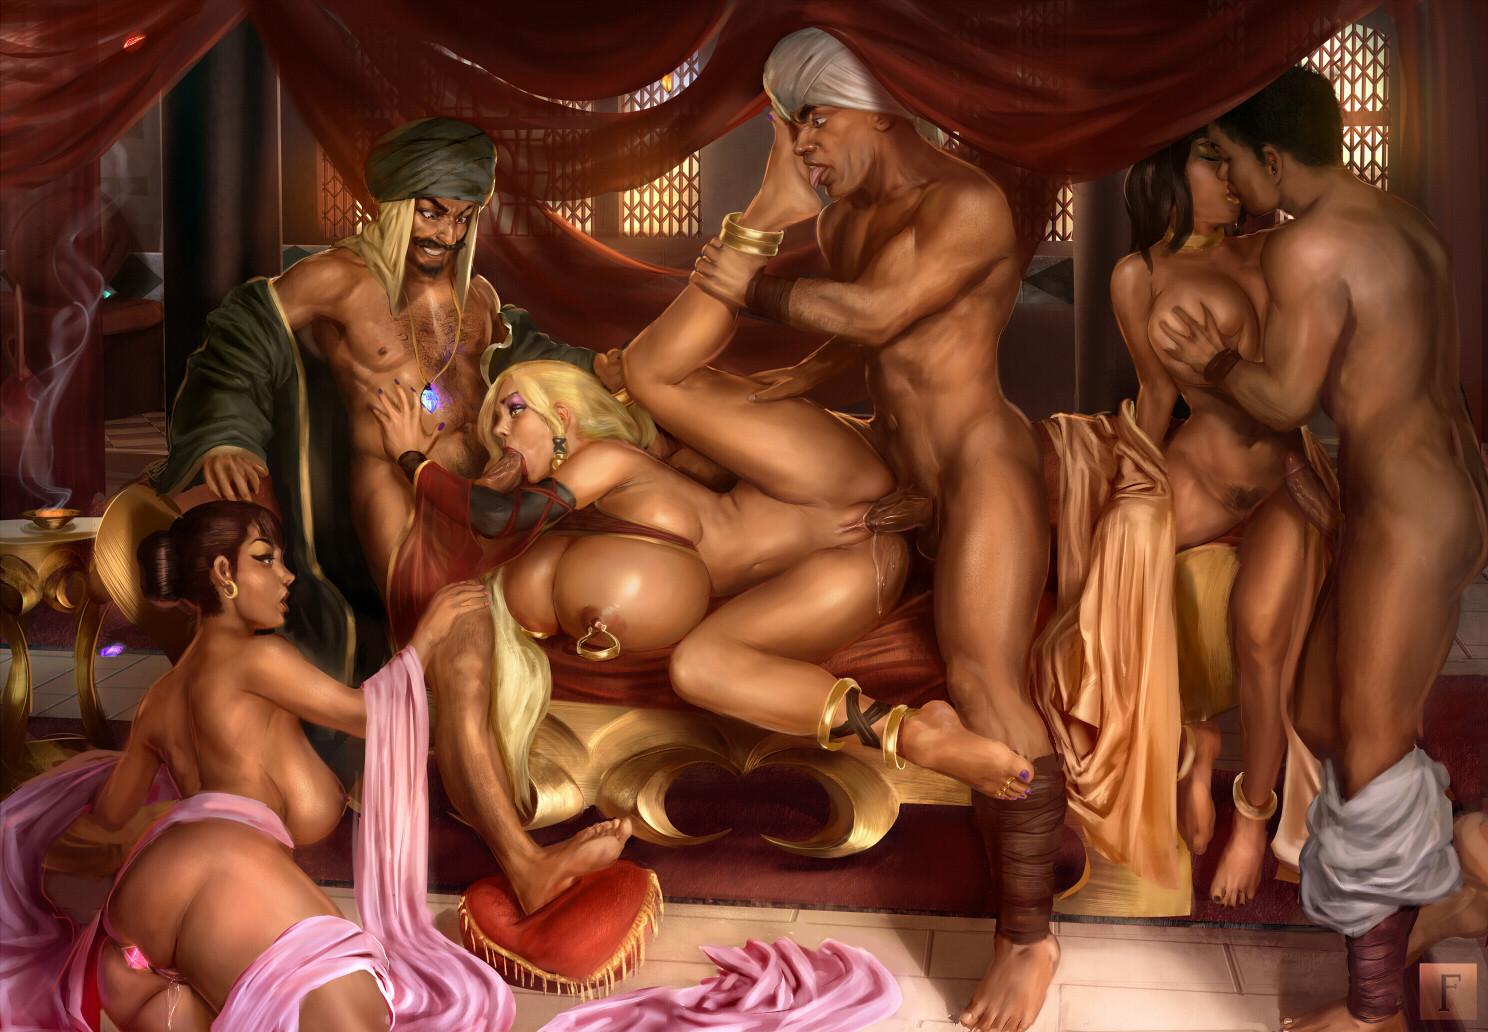 Artist porn collection